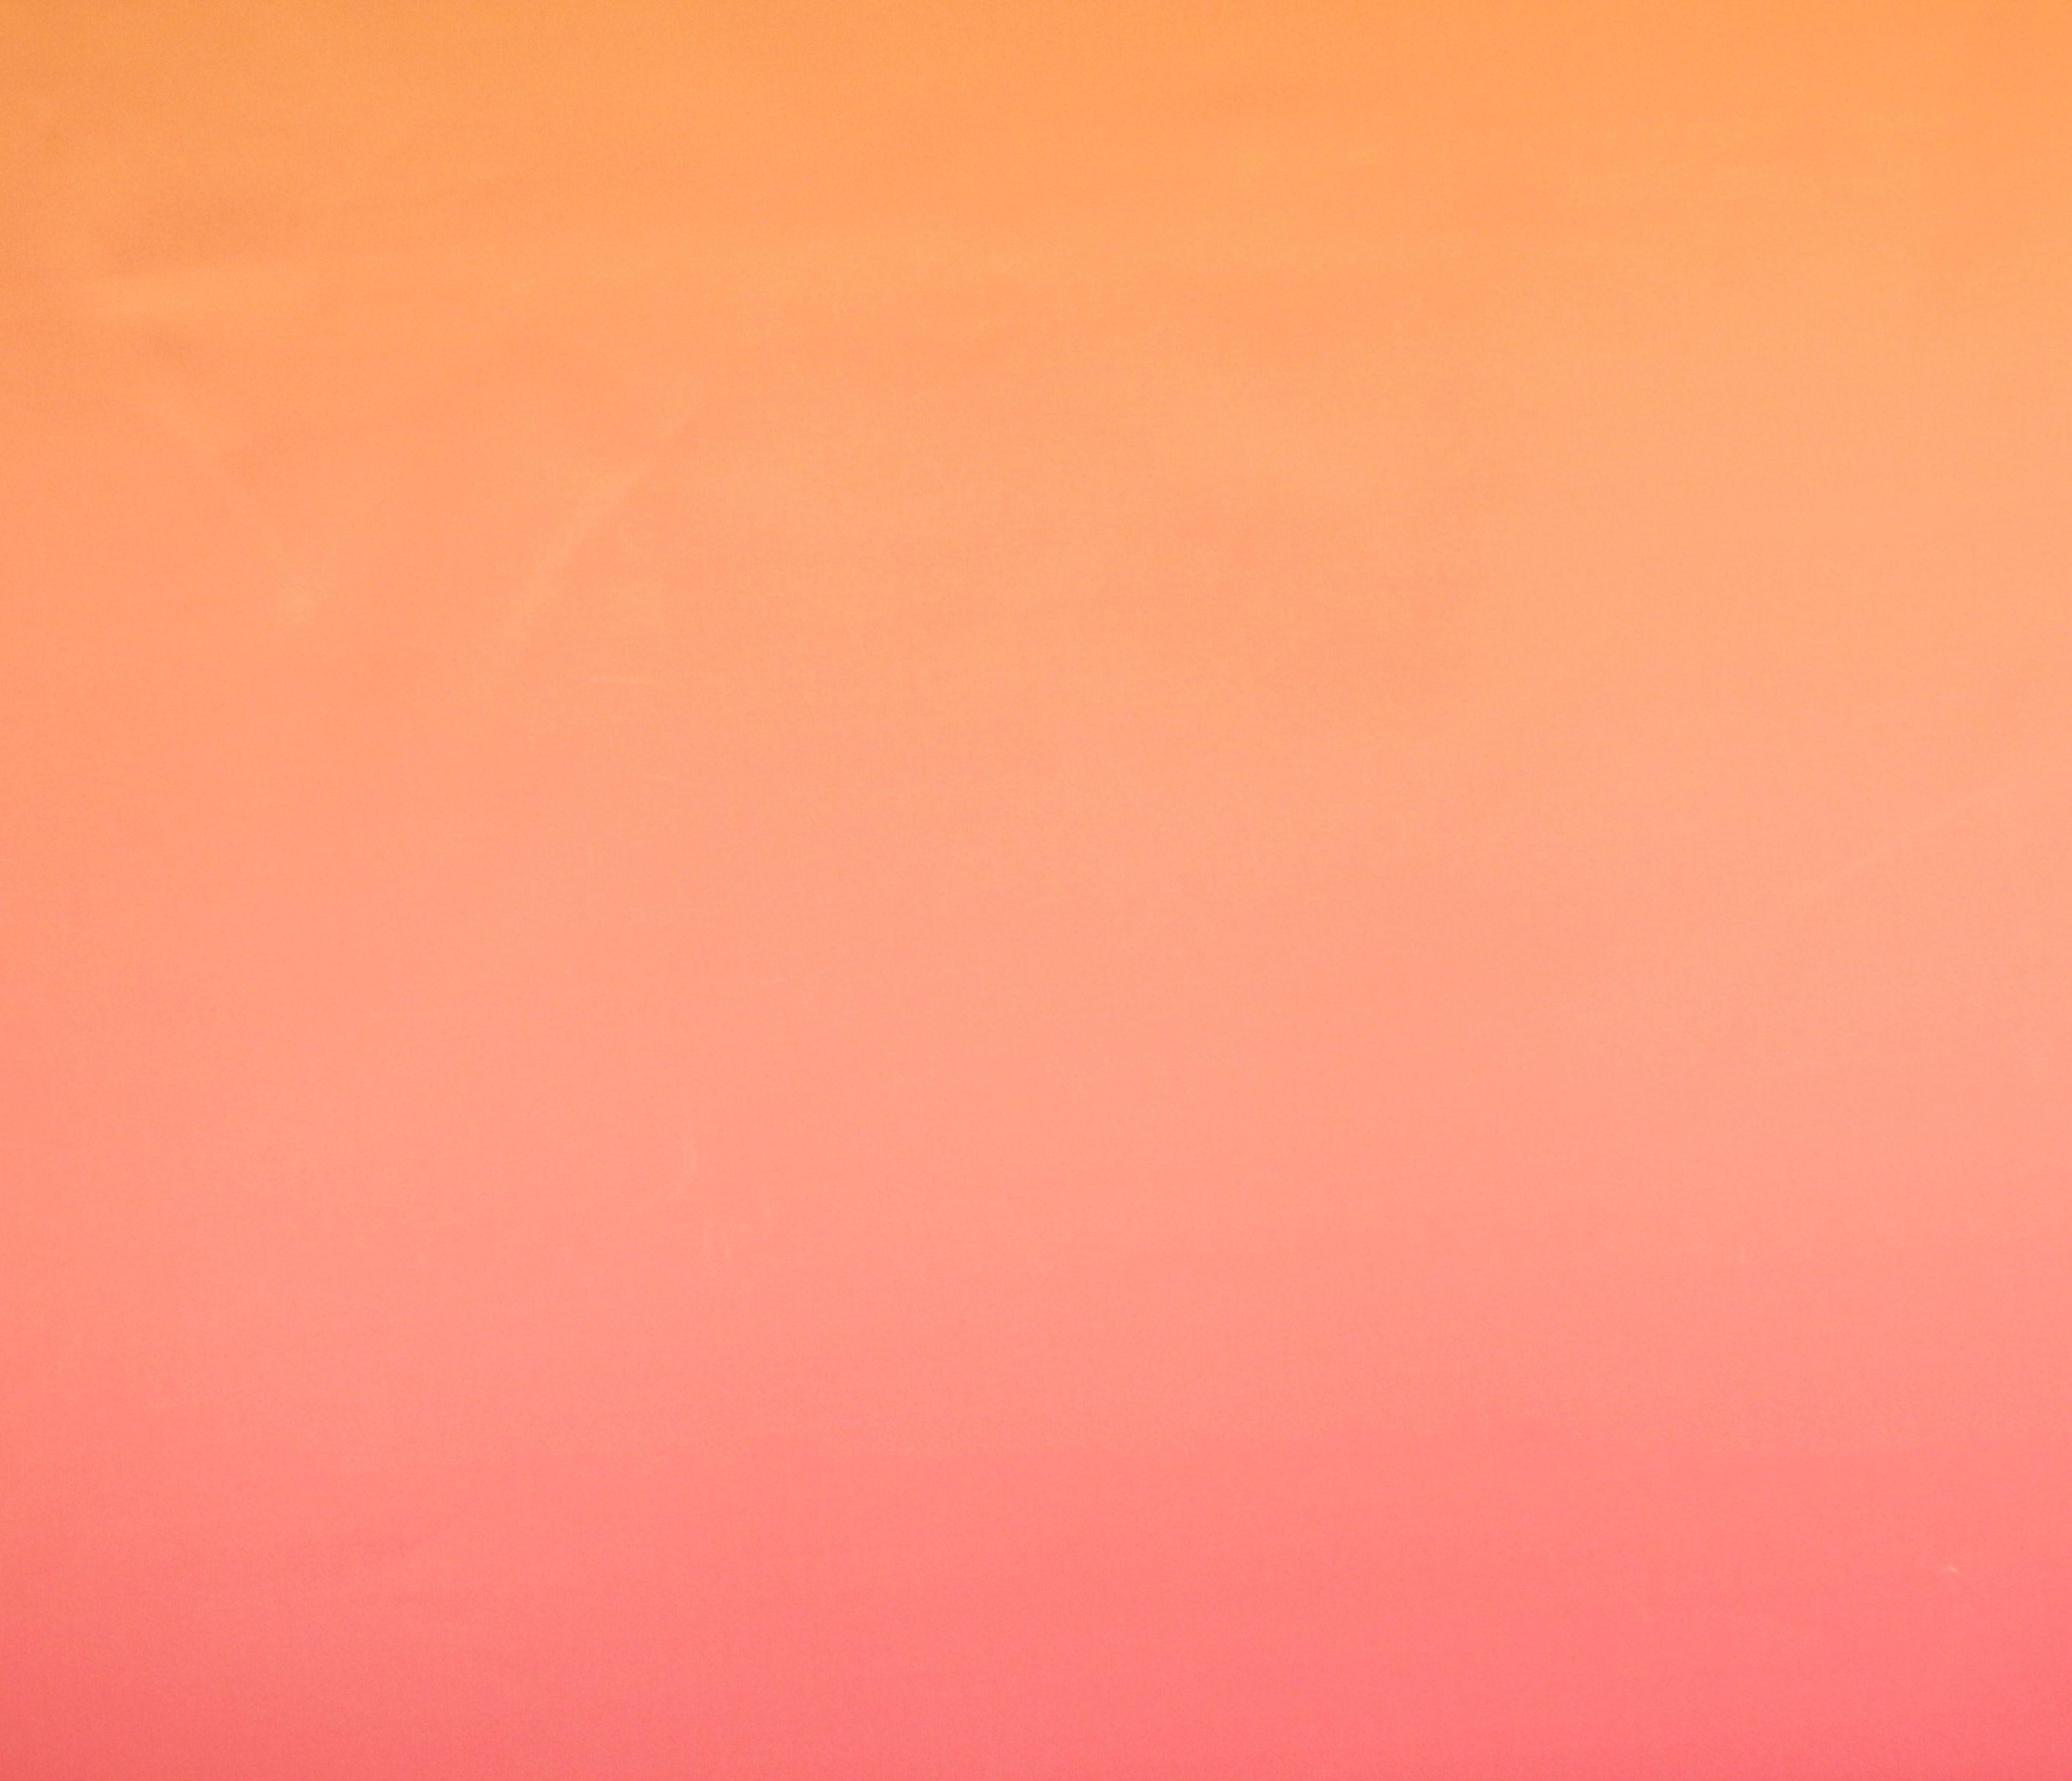 Fond Degrade Rouge Orange Background Peinture Murale Parement Mural Peinture Mur